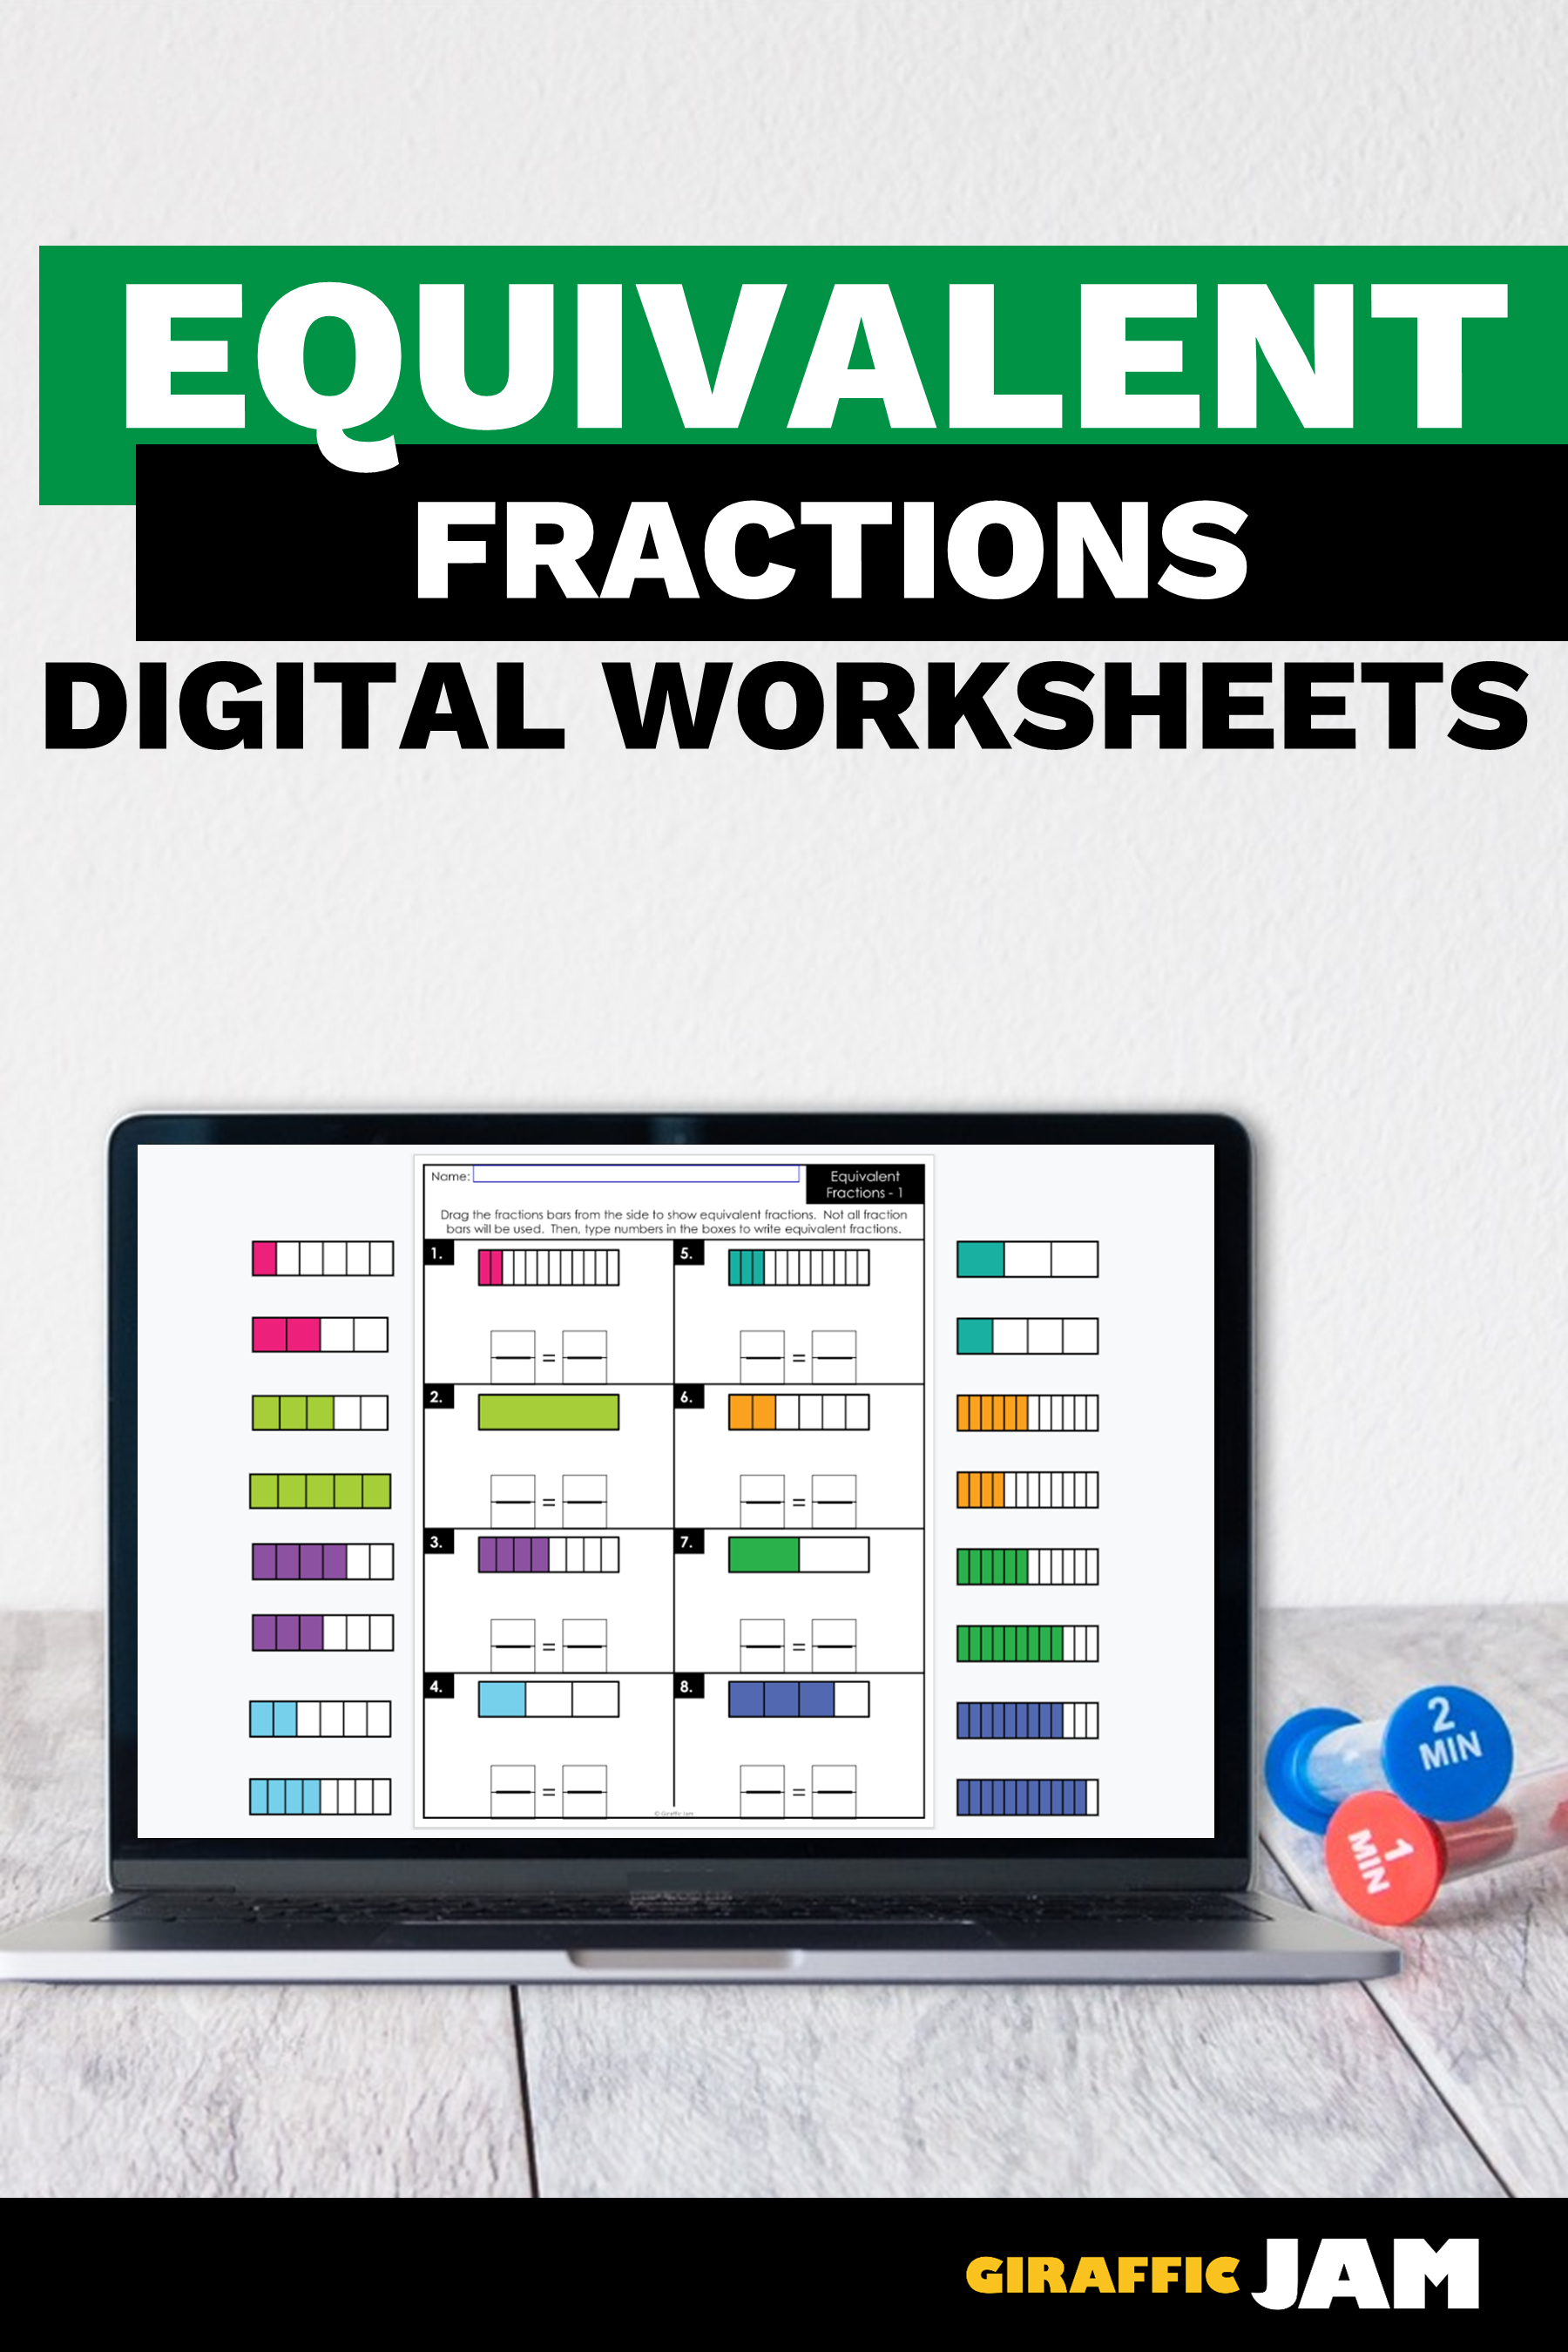 4th Grade Fractions Fraction Worksheets Equivalent Fractions Digital Worksheets D Fractions Worksheets Google Classroom Activities Fractions Elementary [ 2700 x 1800 Pixel ]